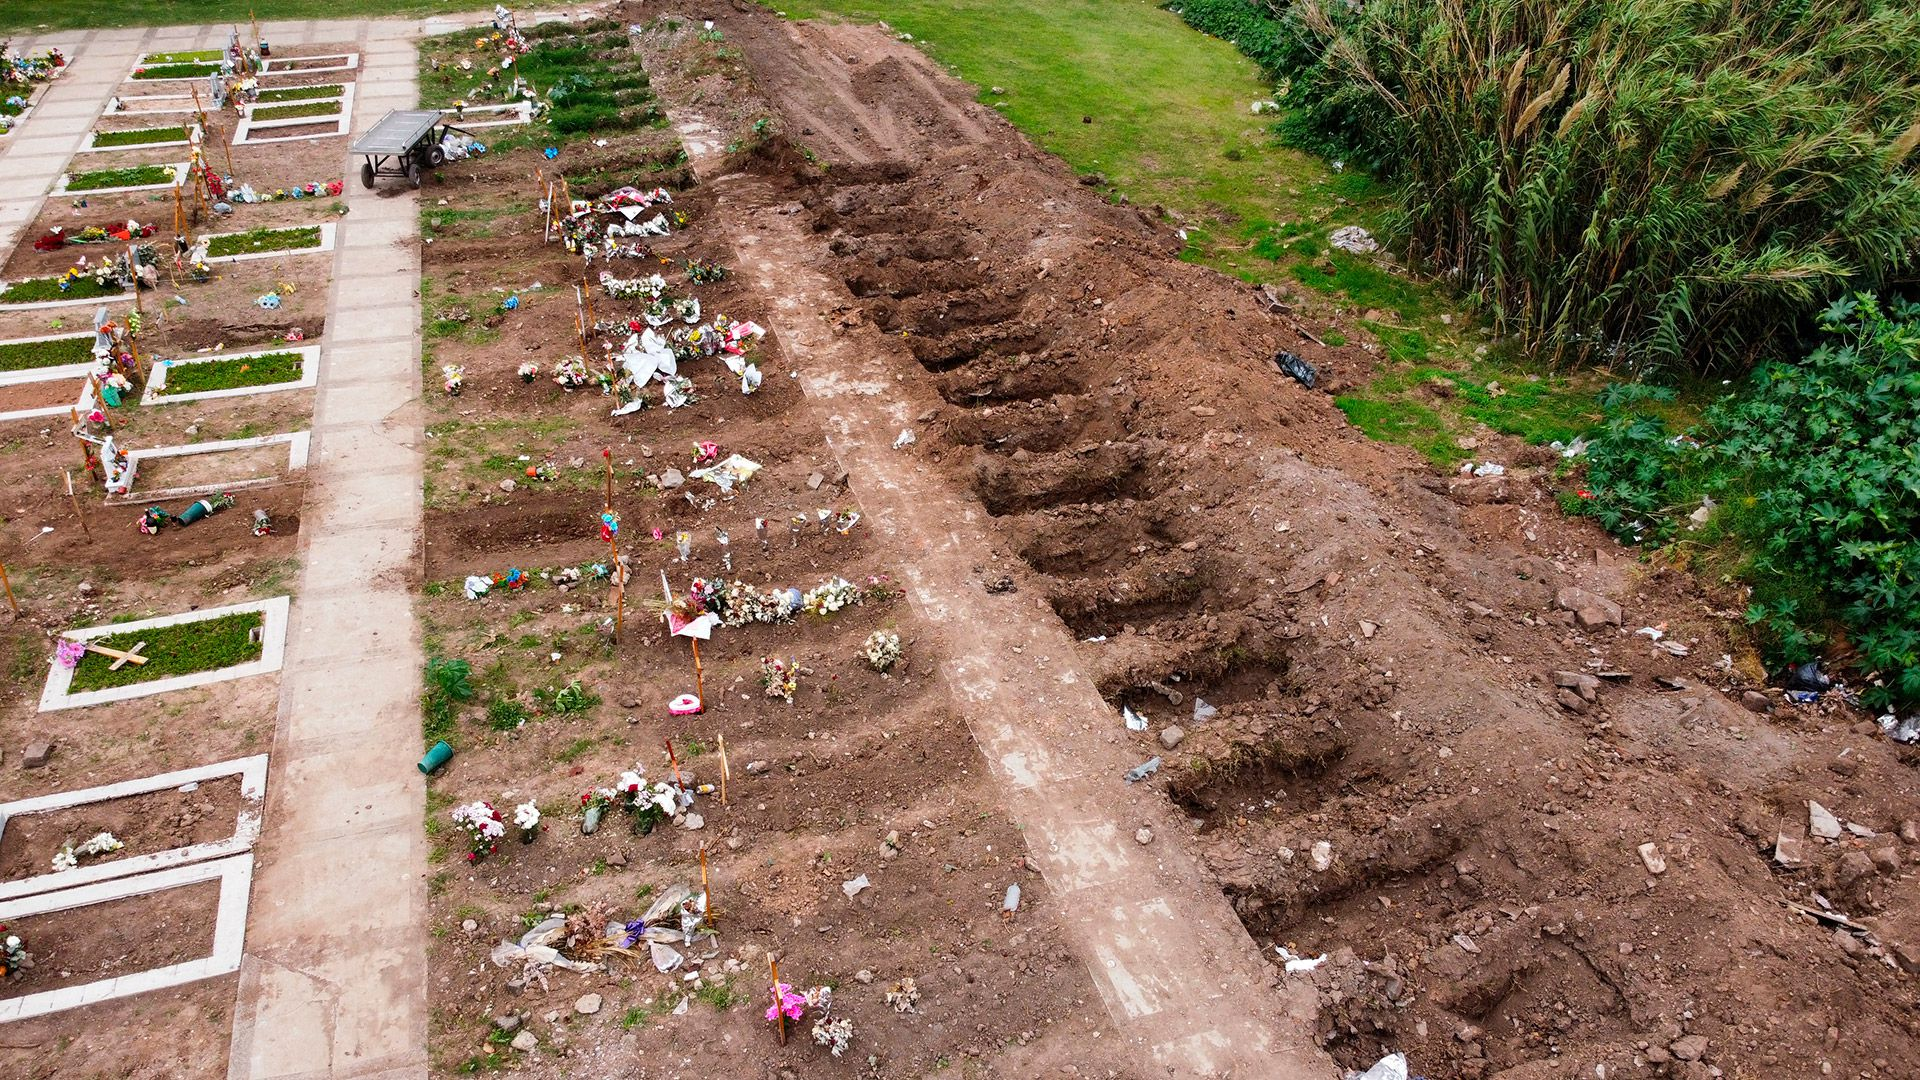 tumbas cementerio bajo flores covid 19